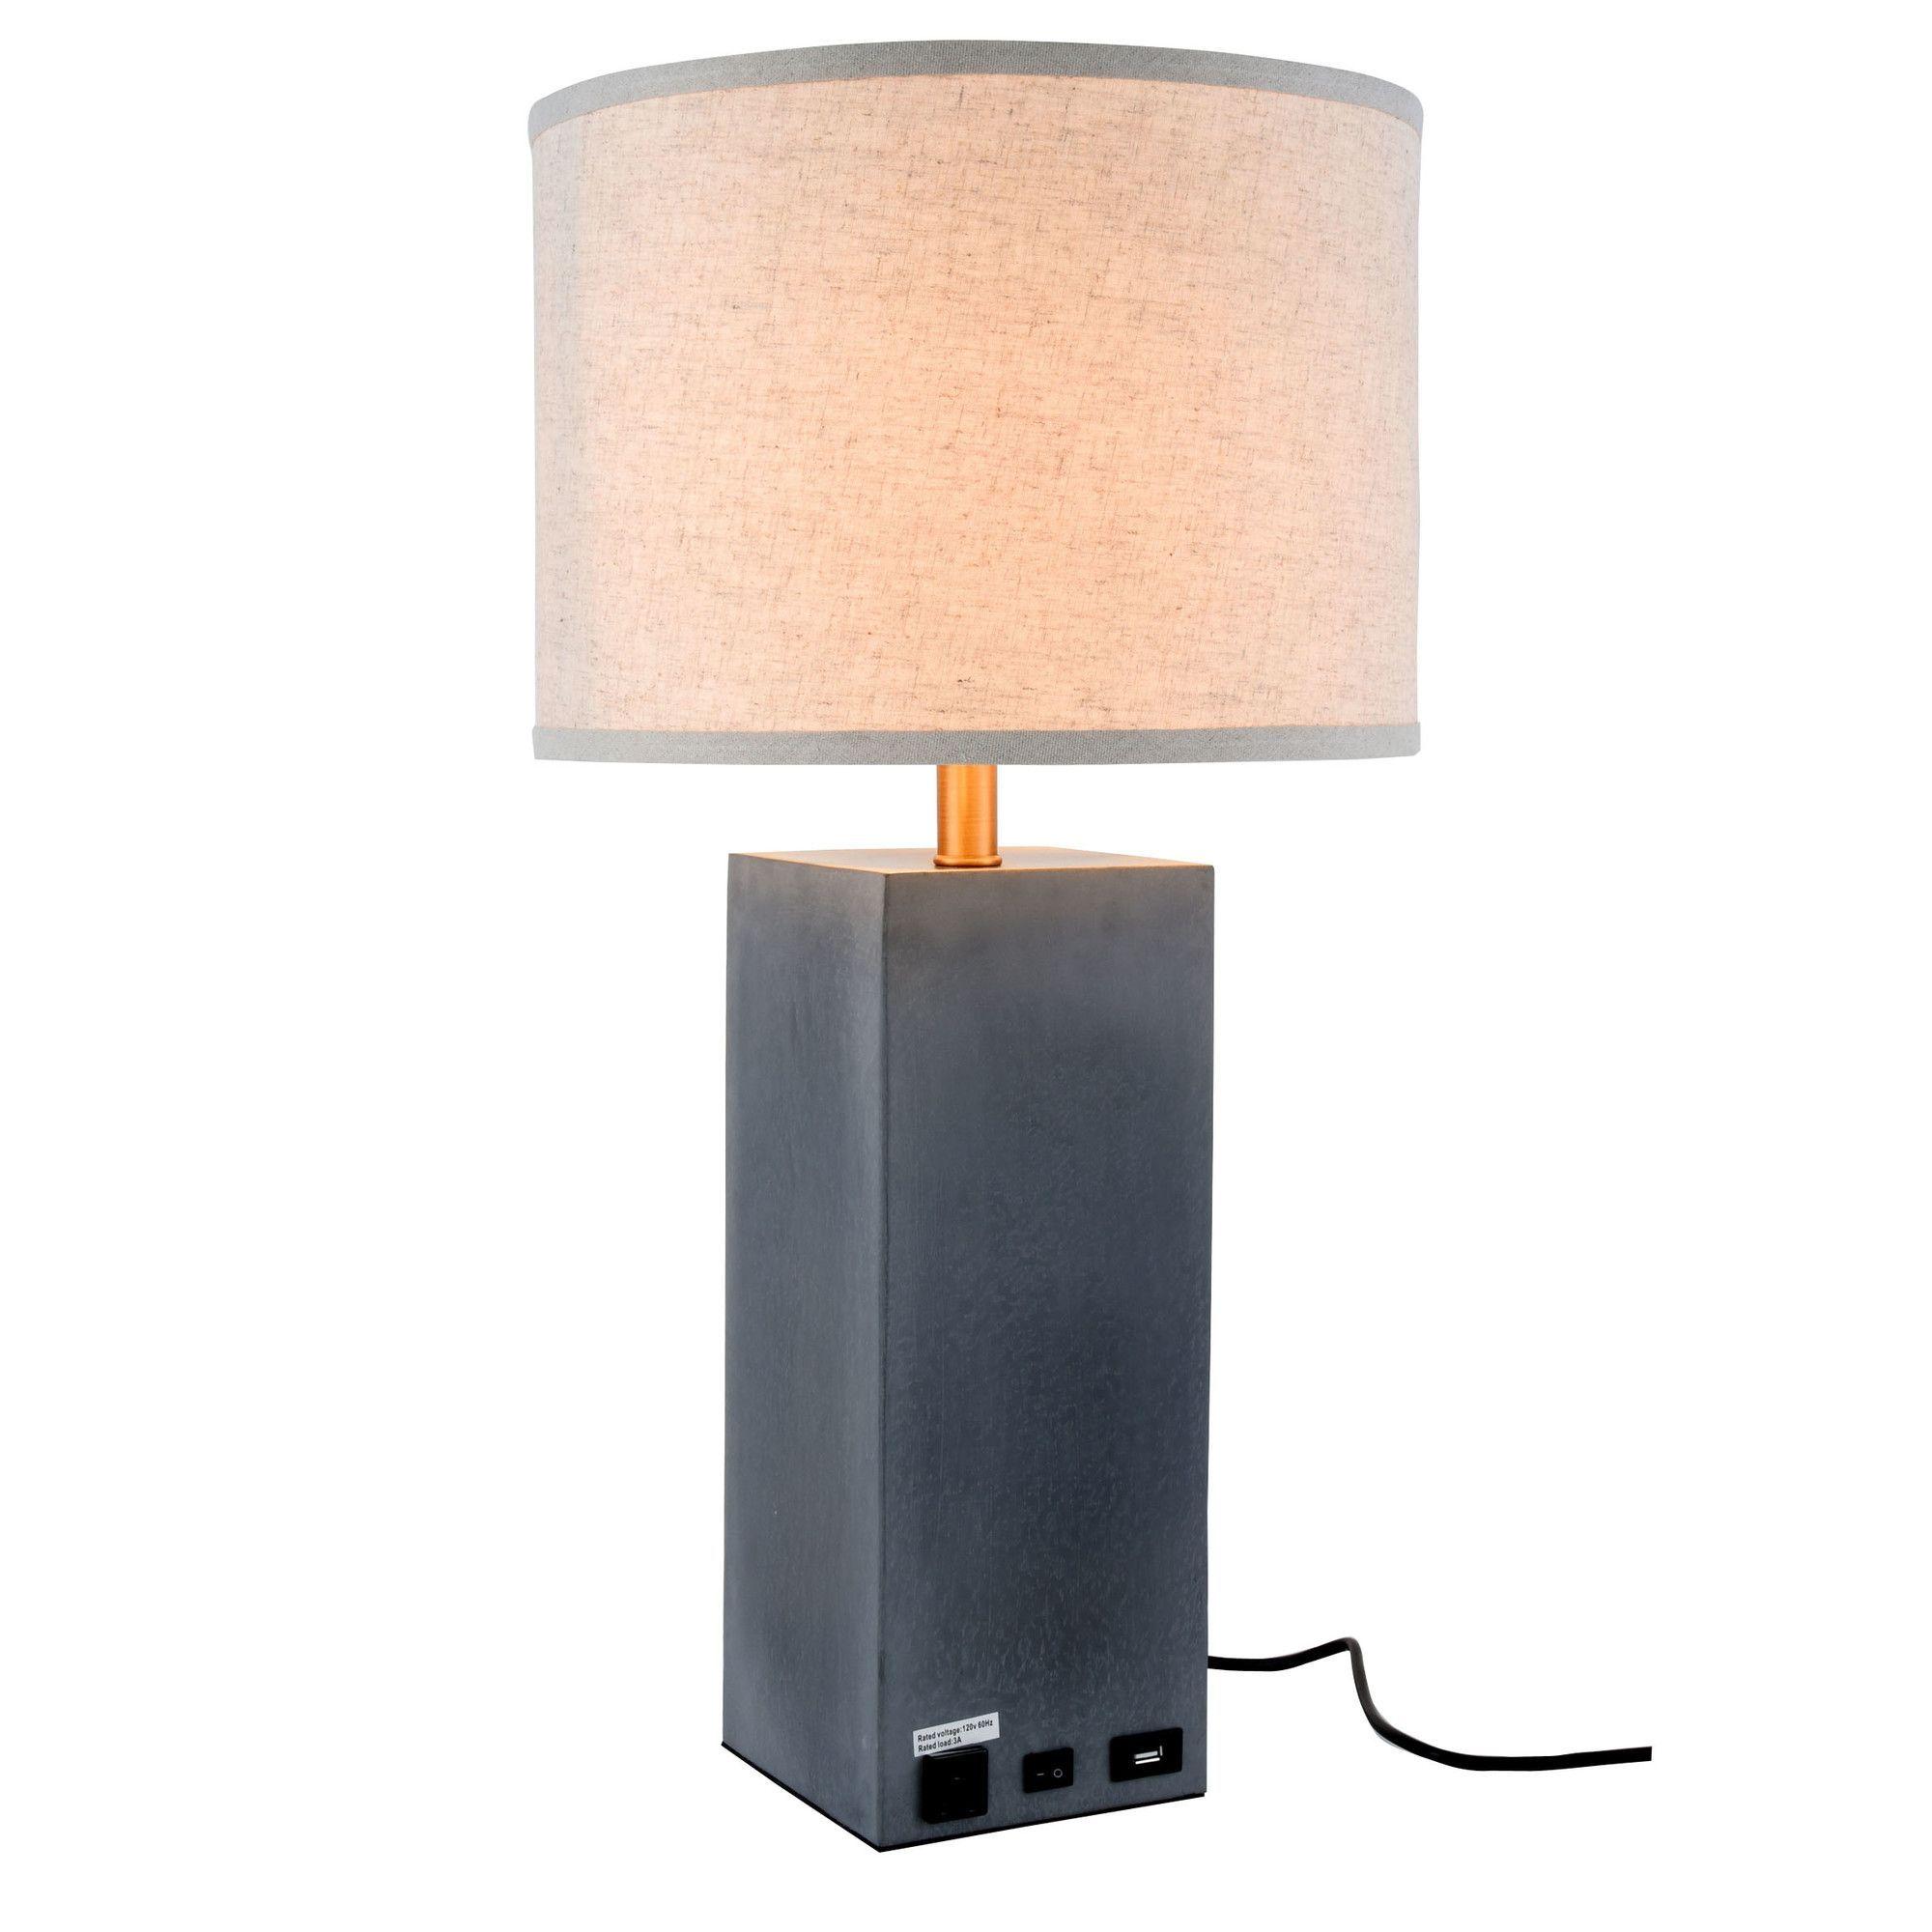 "Brio 27"" Table Lamp"